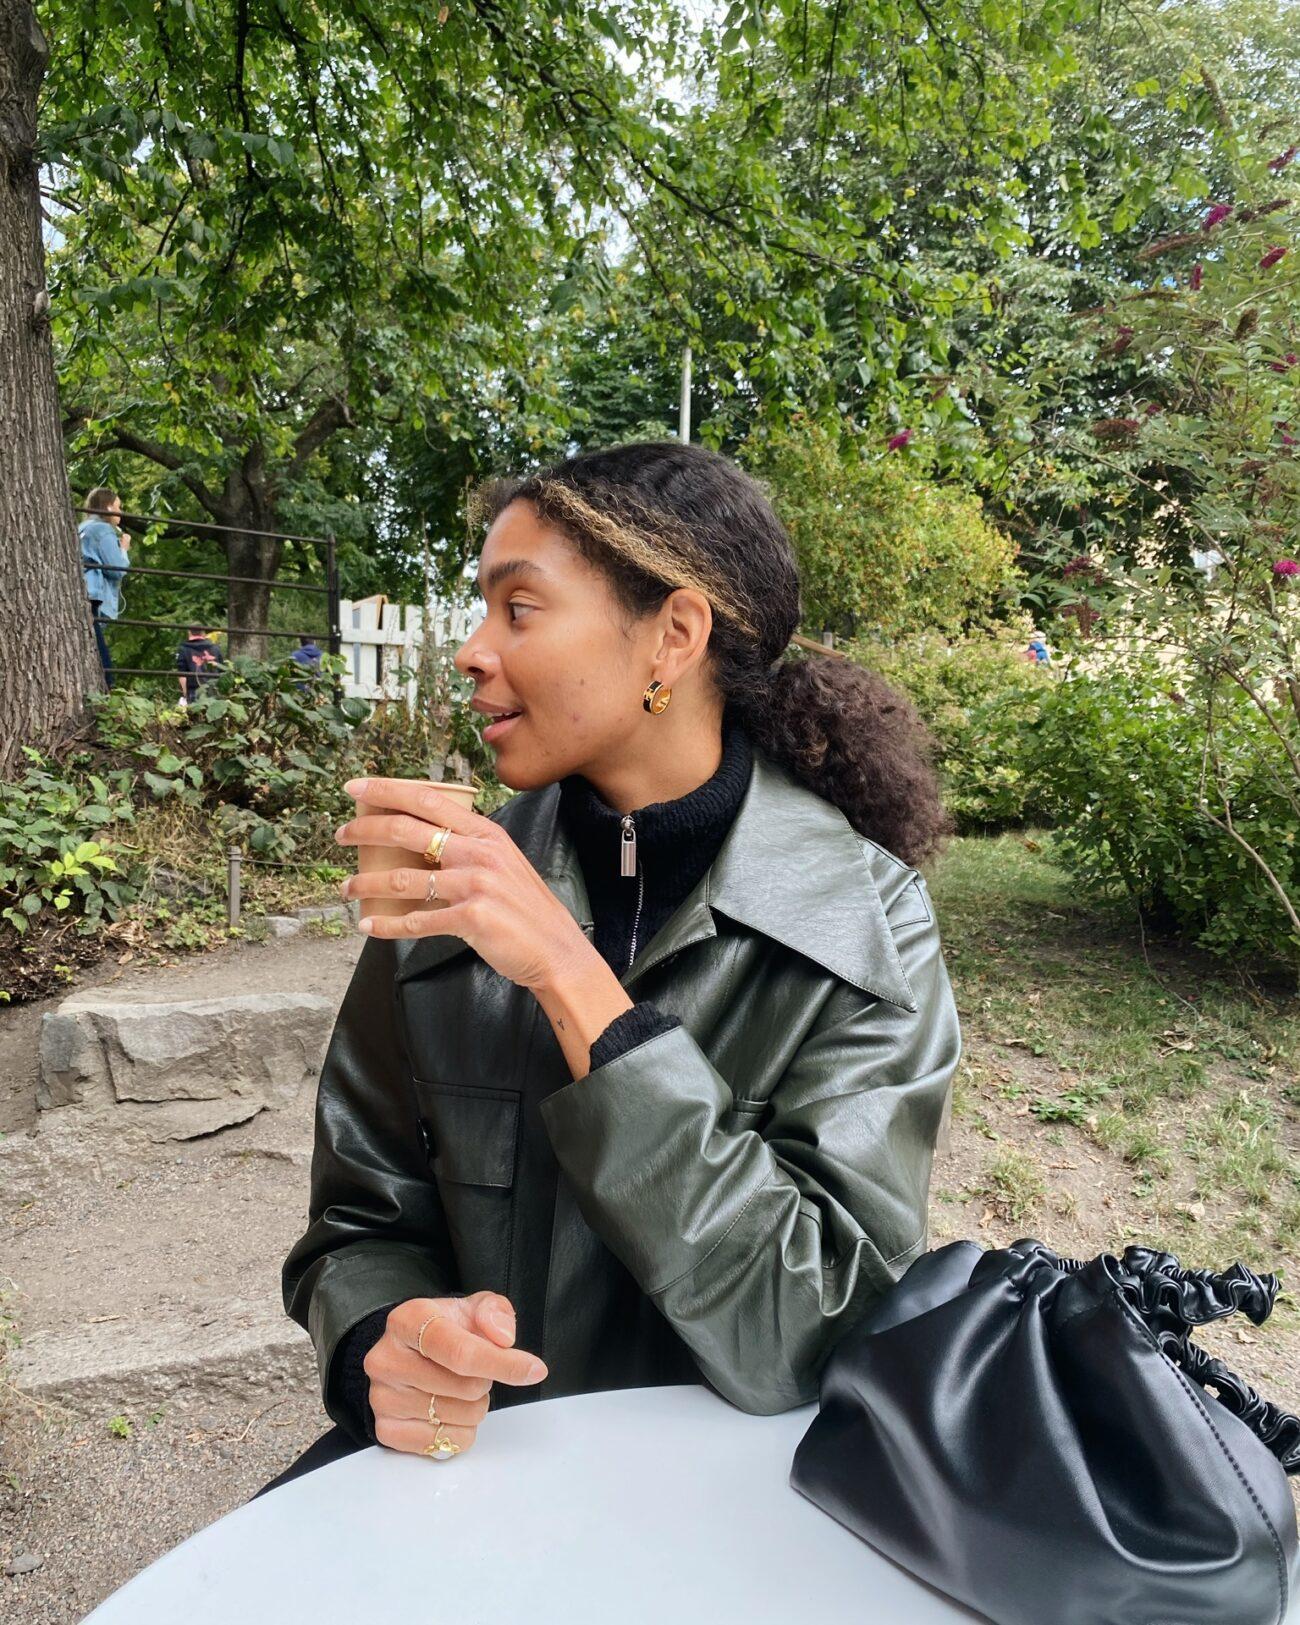 Sara Flaaen wearing EMIN + PAUL khaki faux leather jacket.